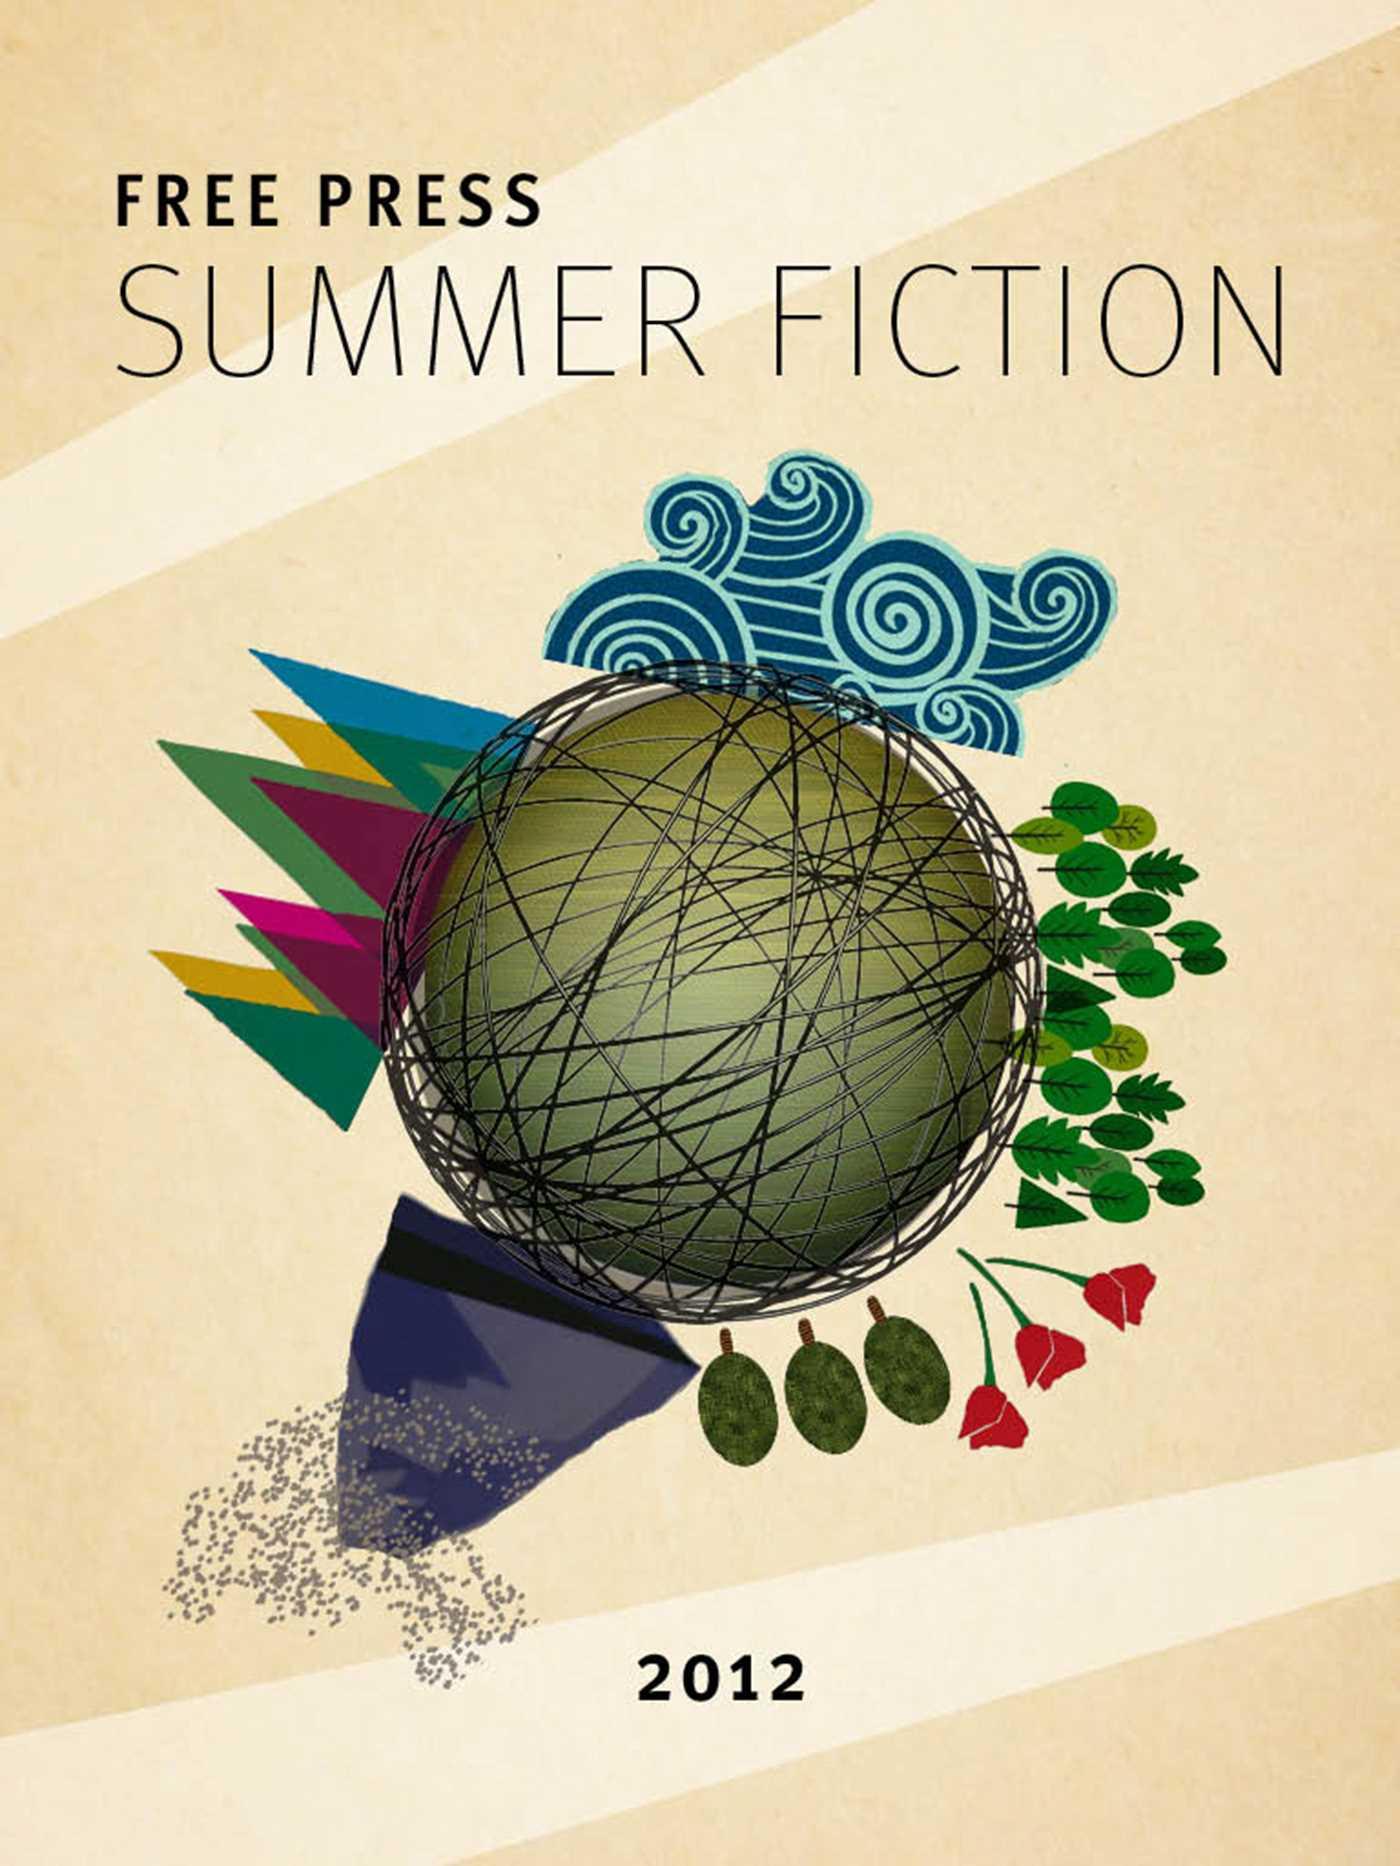 Free press summer fiction sampler 9781451679342 hr